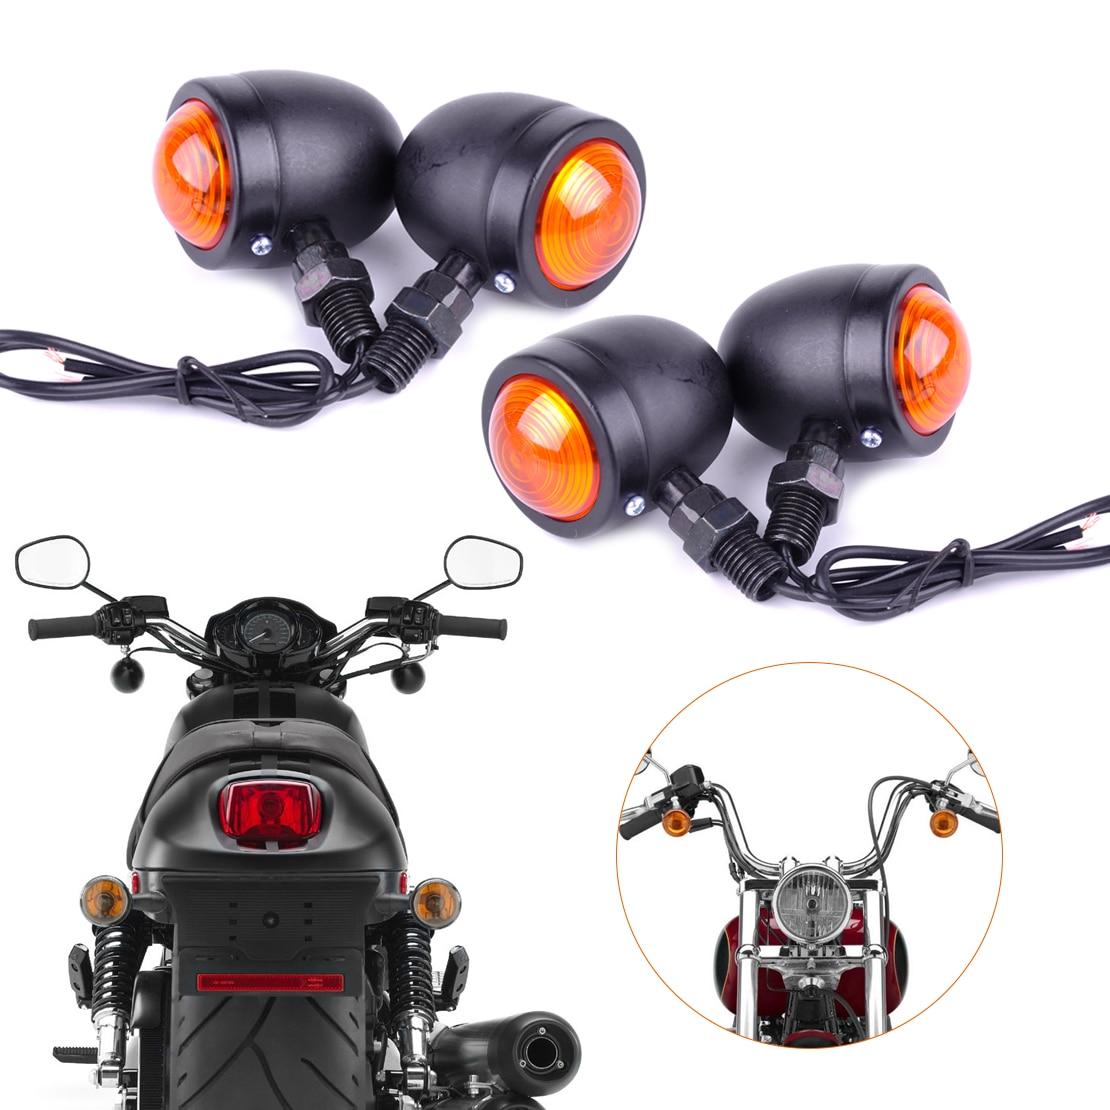 DWCX Motocykl 4x 12V Svítidlo Svítidla Svítidla Svítidla Světelná světelná svítidla pro Harley Bobber Chopper Yamaha Suzuki Kawasaki Dirt Bike